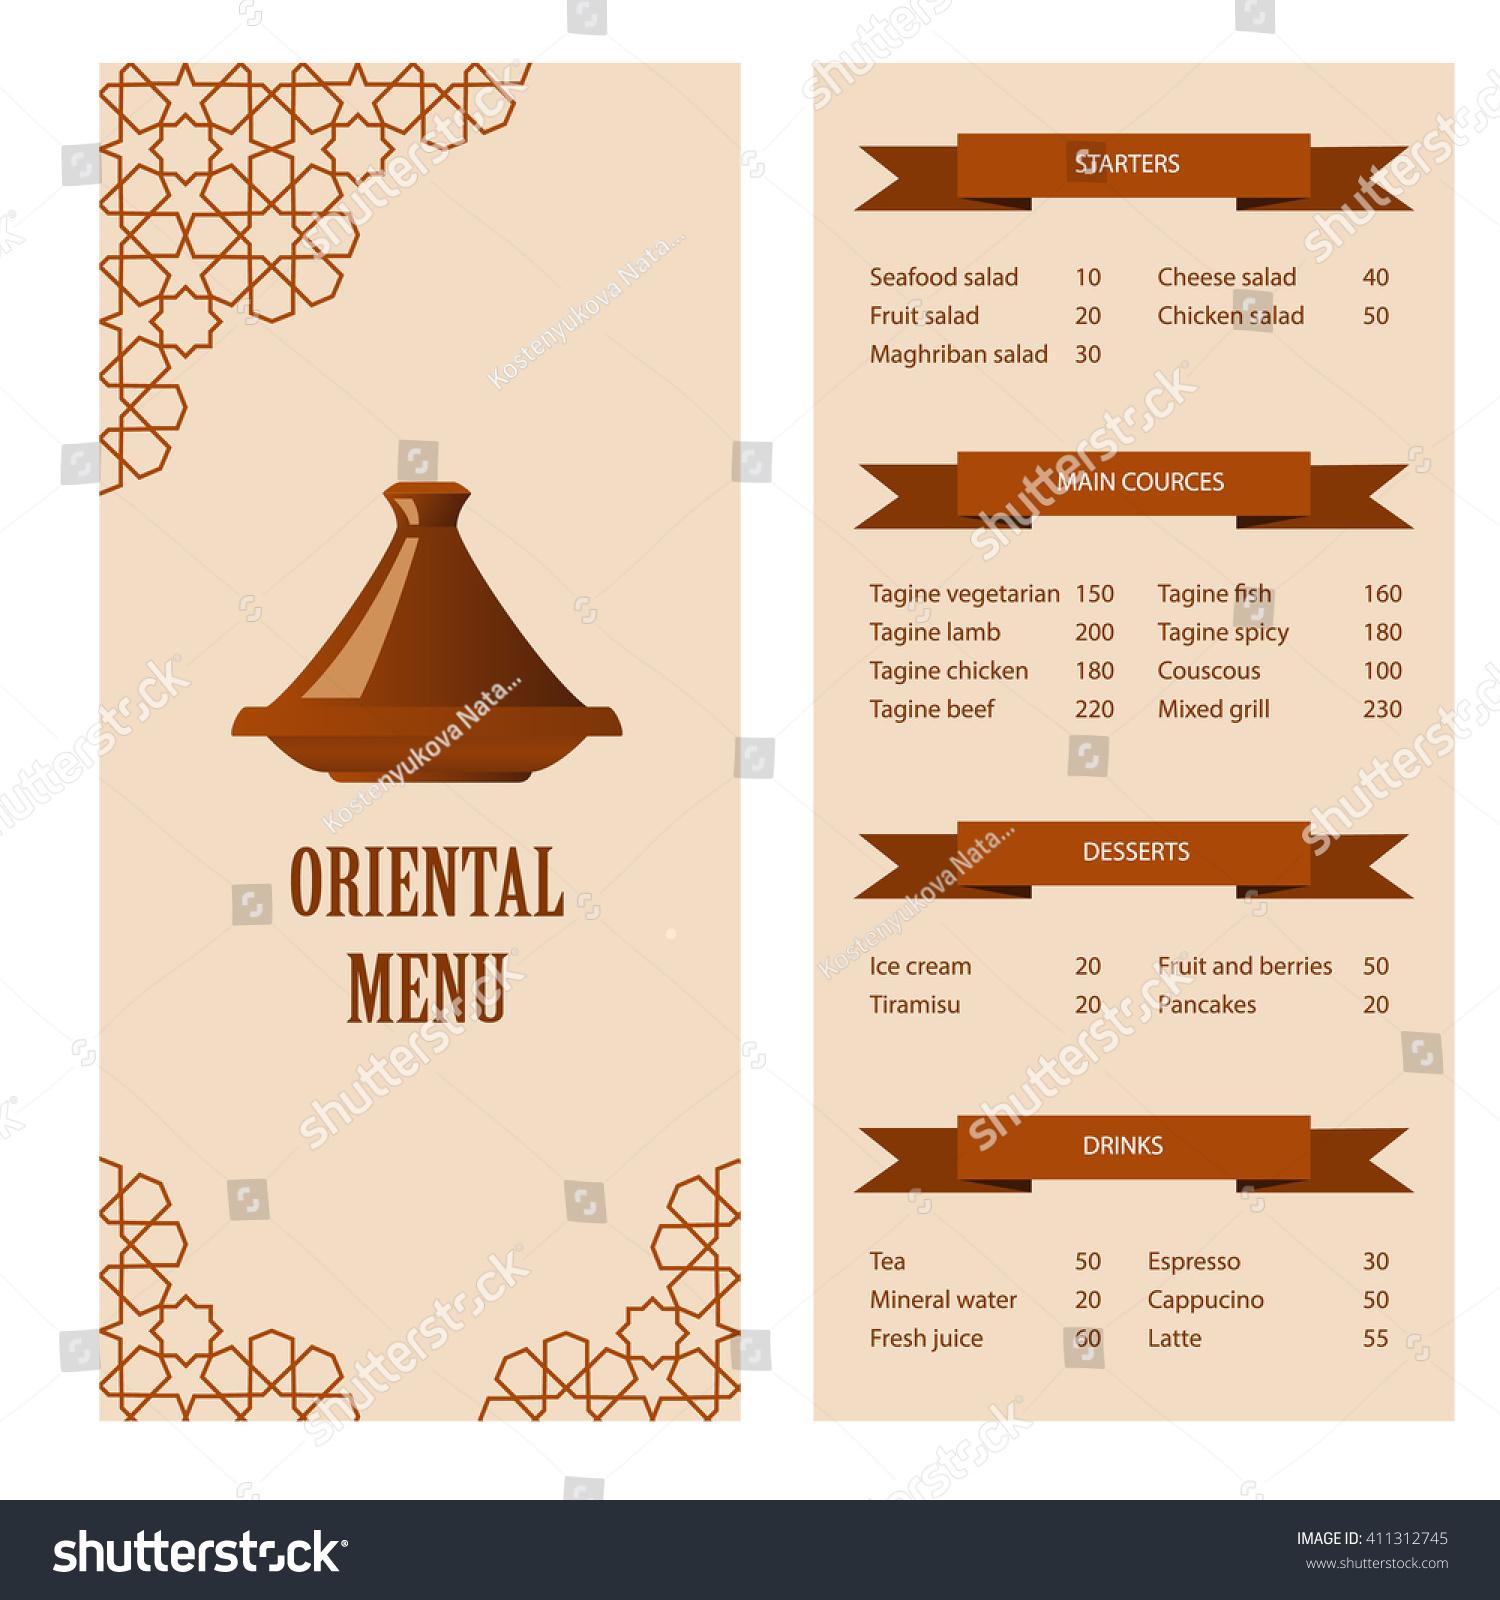 Restaurant Oriental Menu Template Tagine Vector Stock Vector